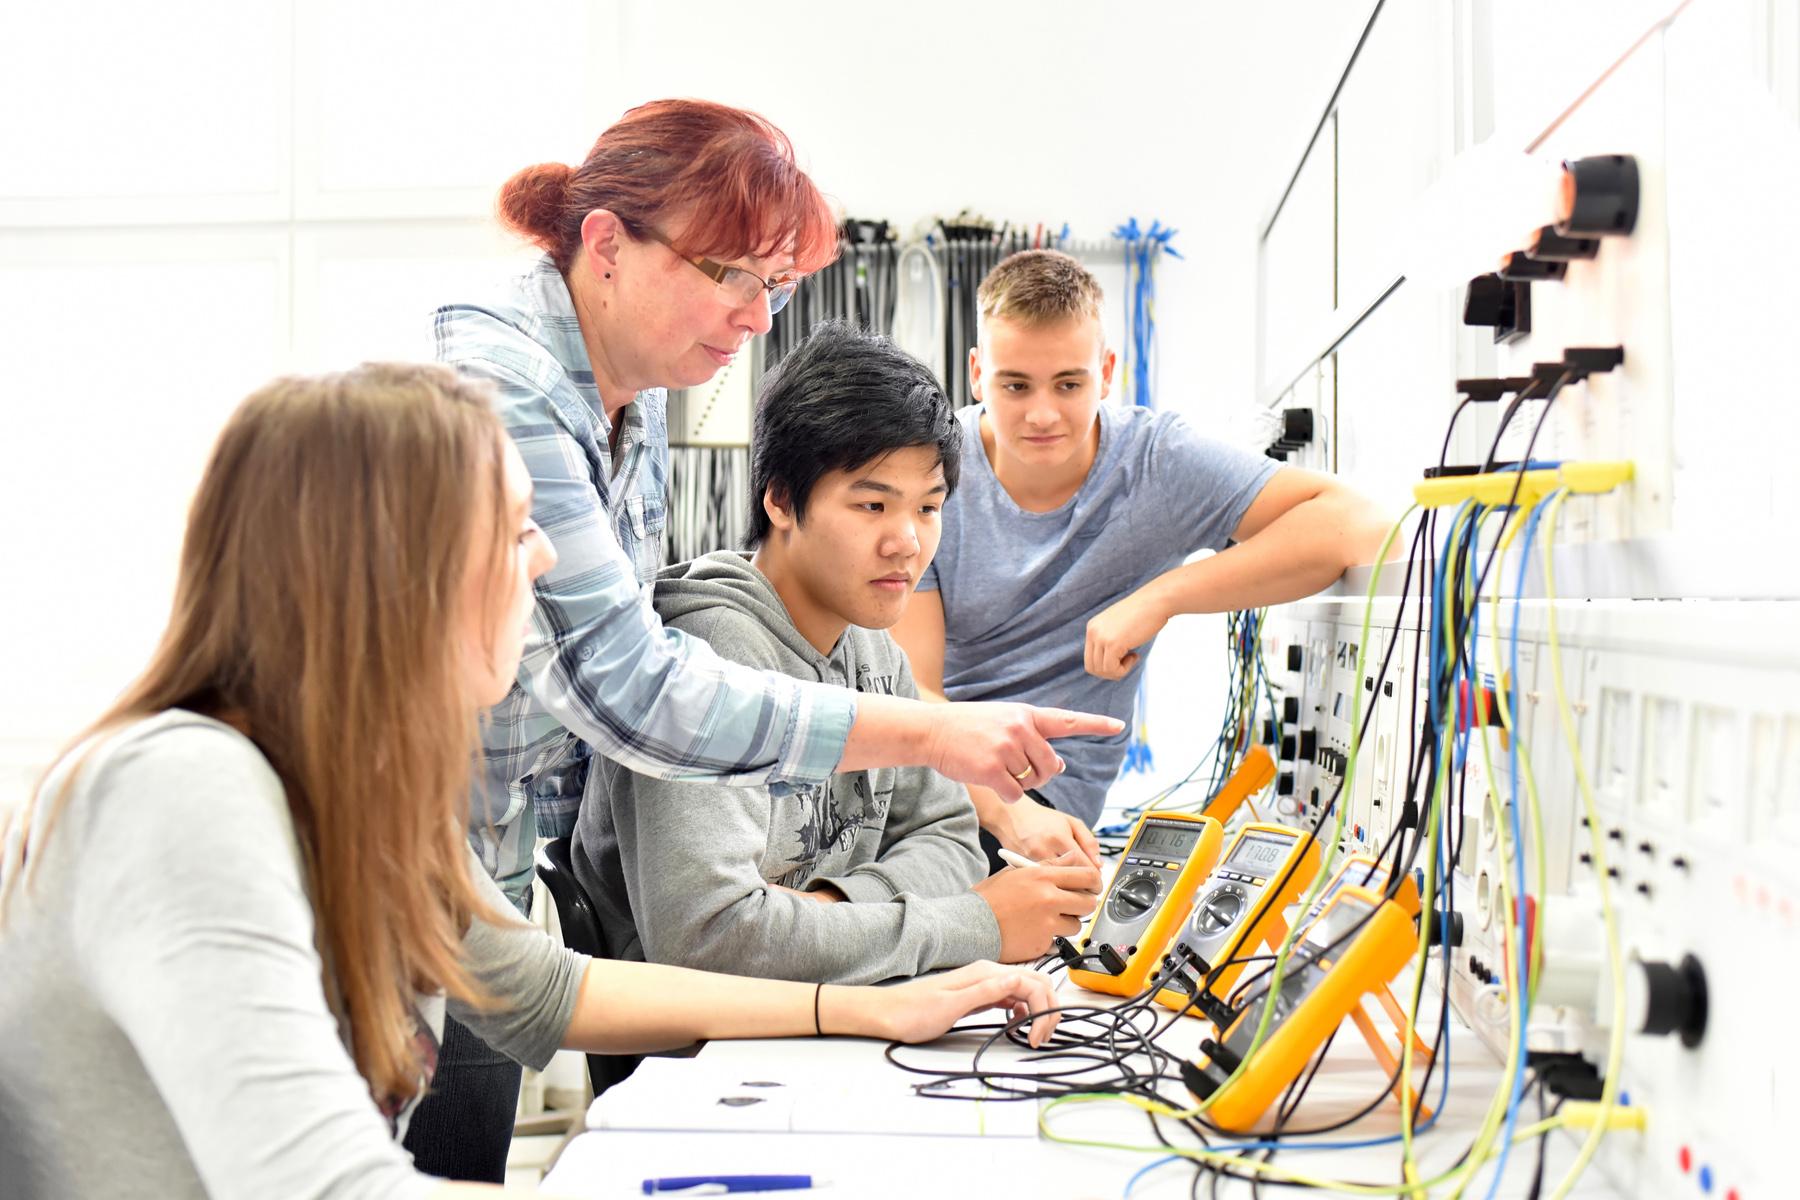 vocational training schools